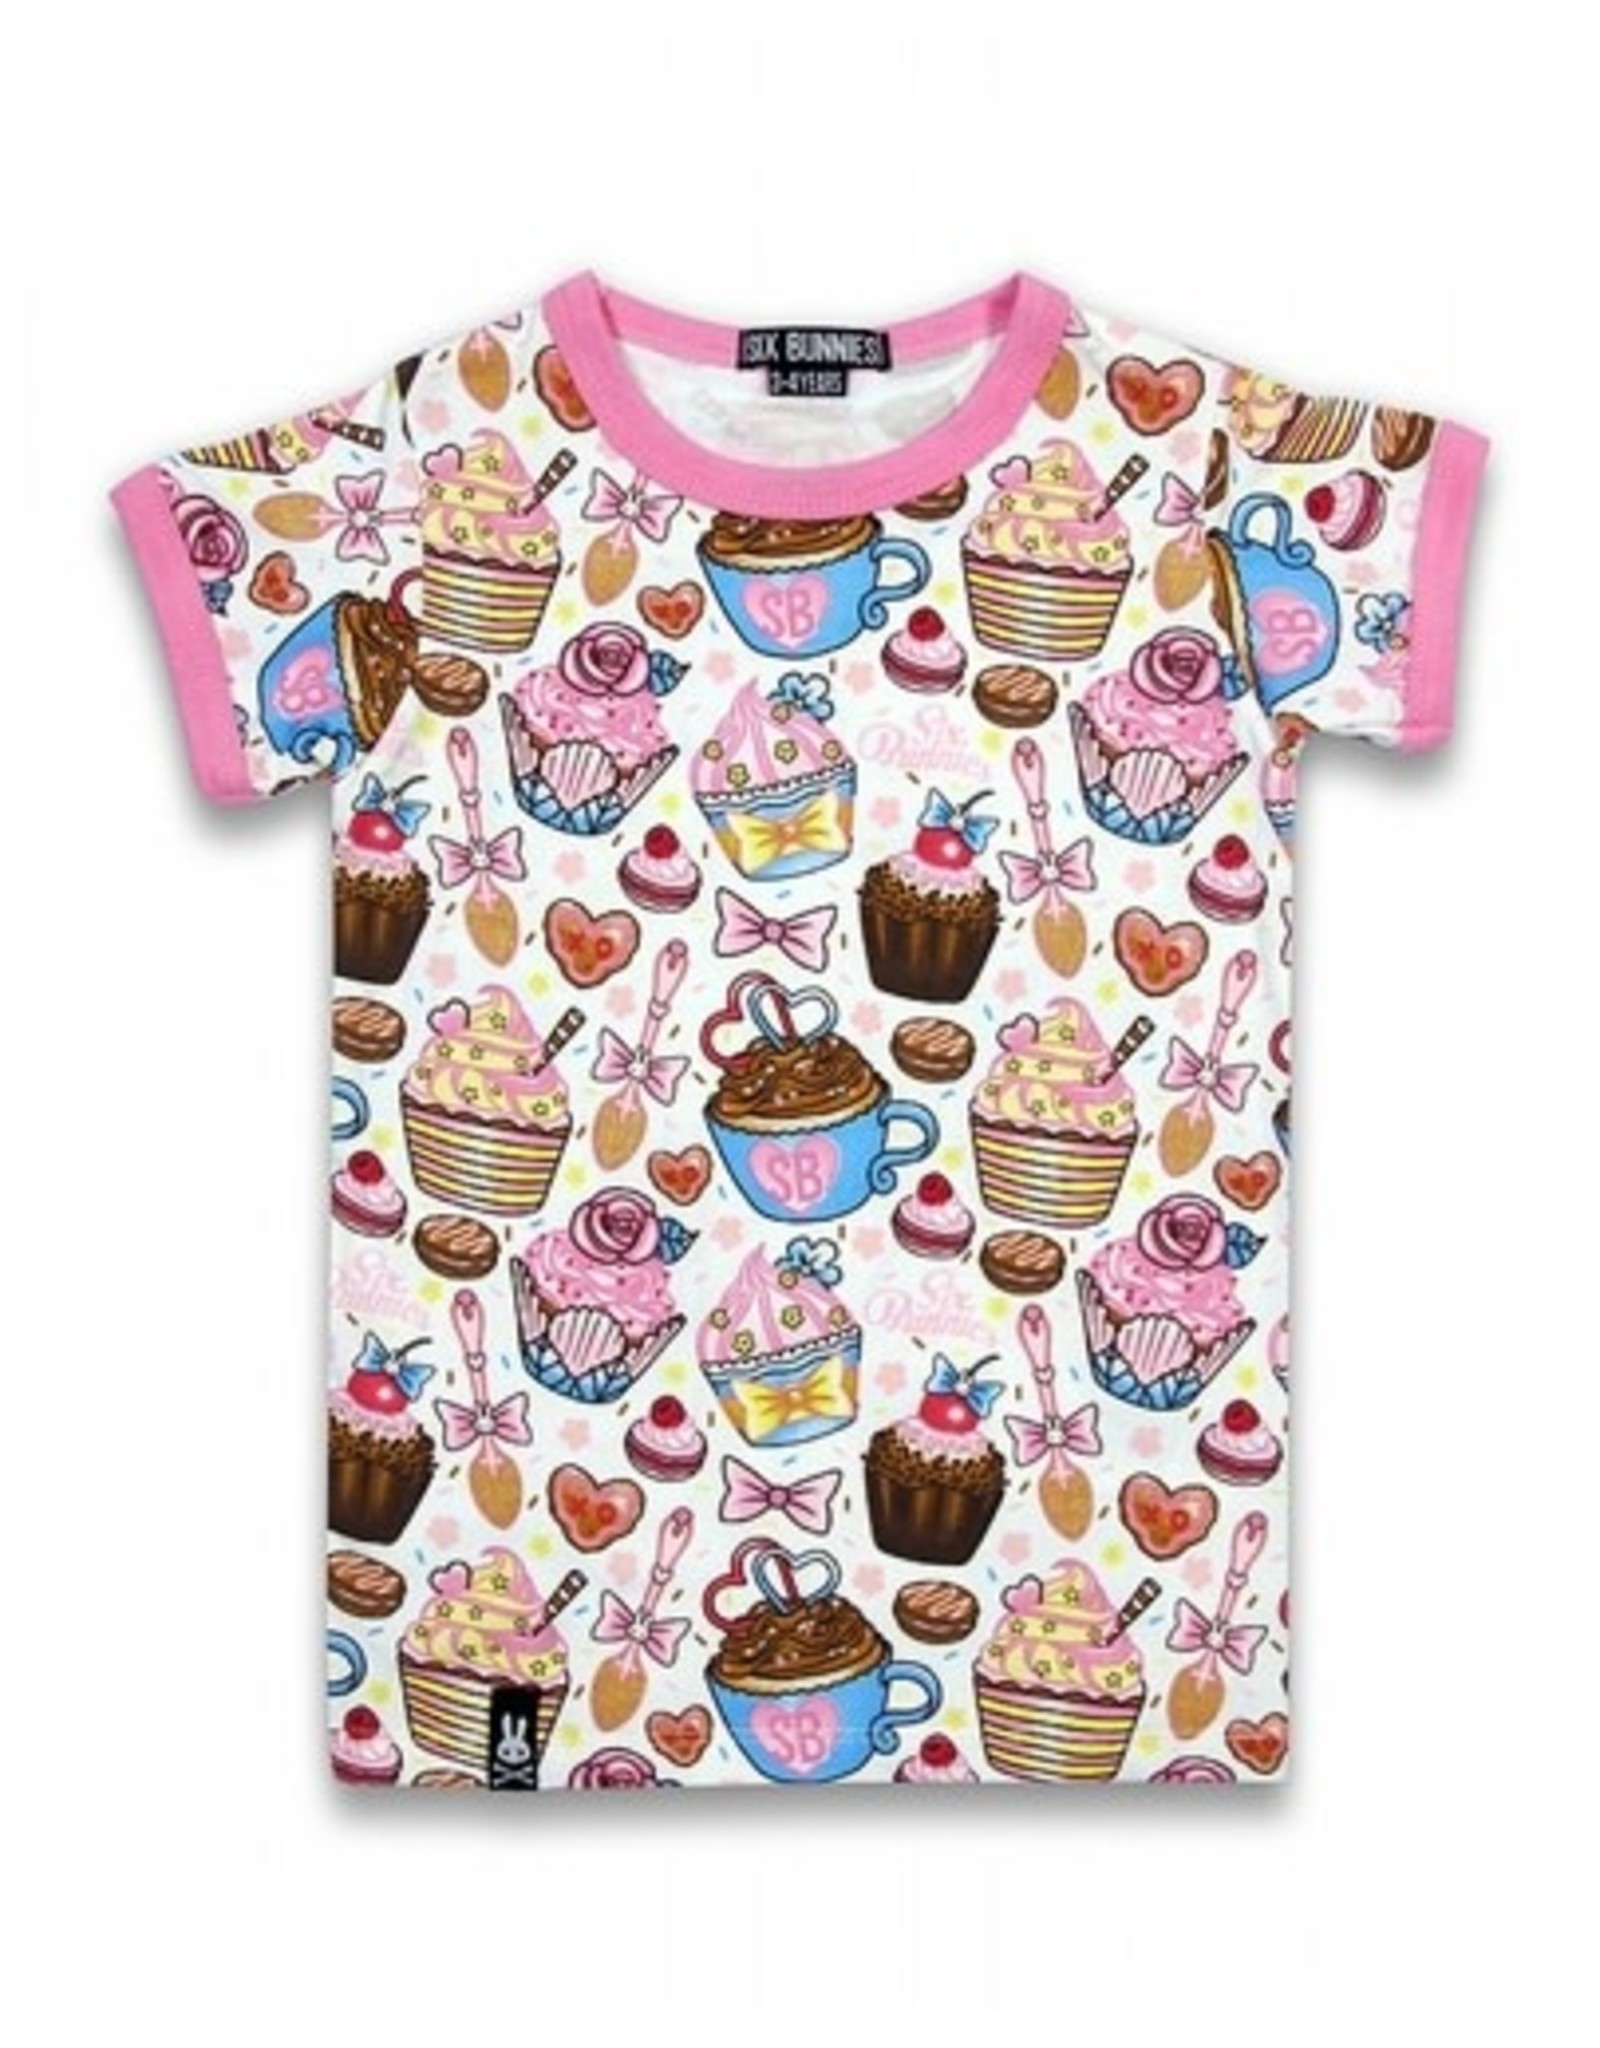 SIX BUNNIES - Cupcakes Tee